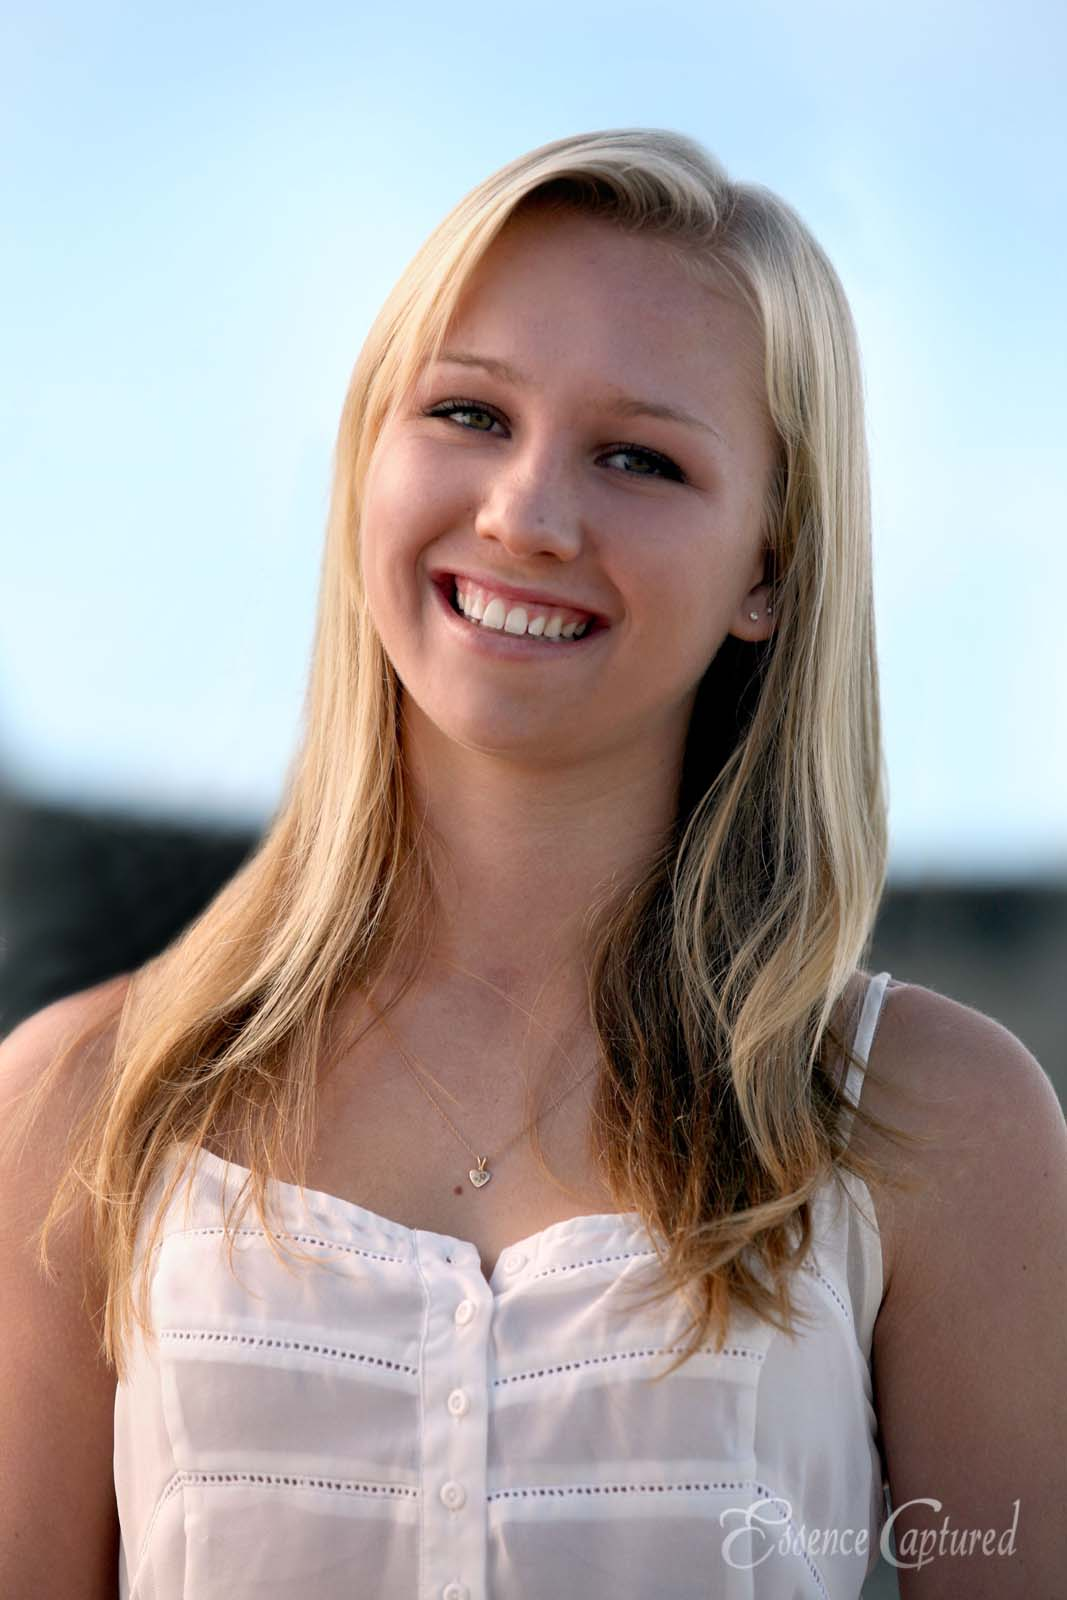 female high school senior portrait long blonde hair